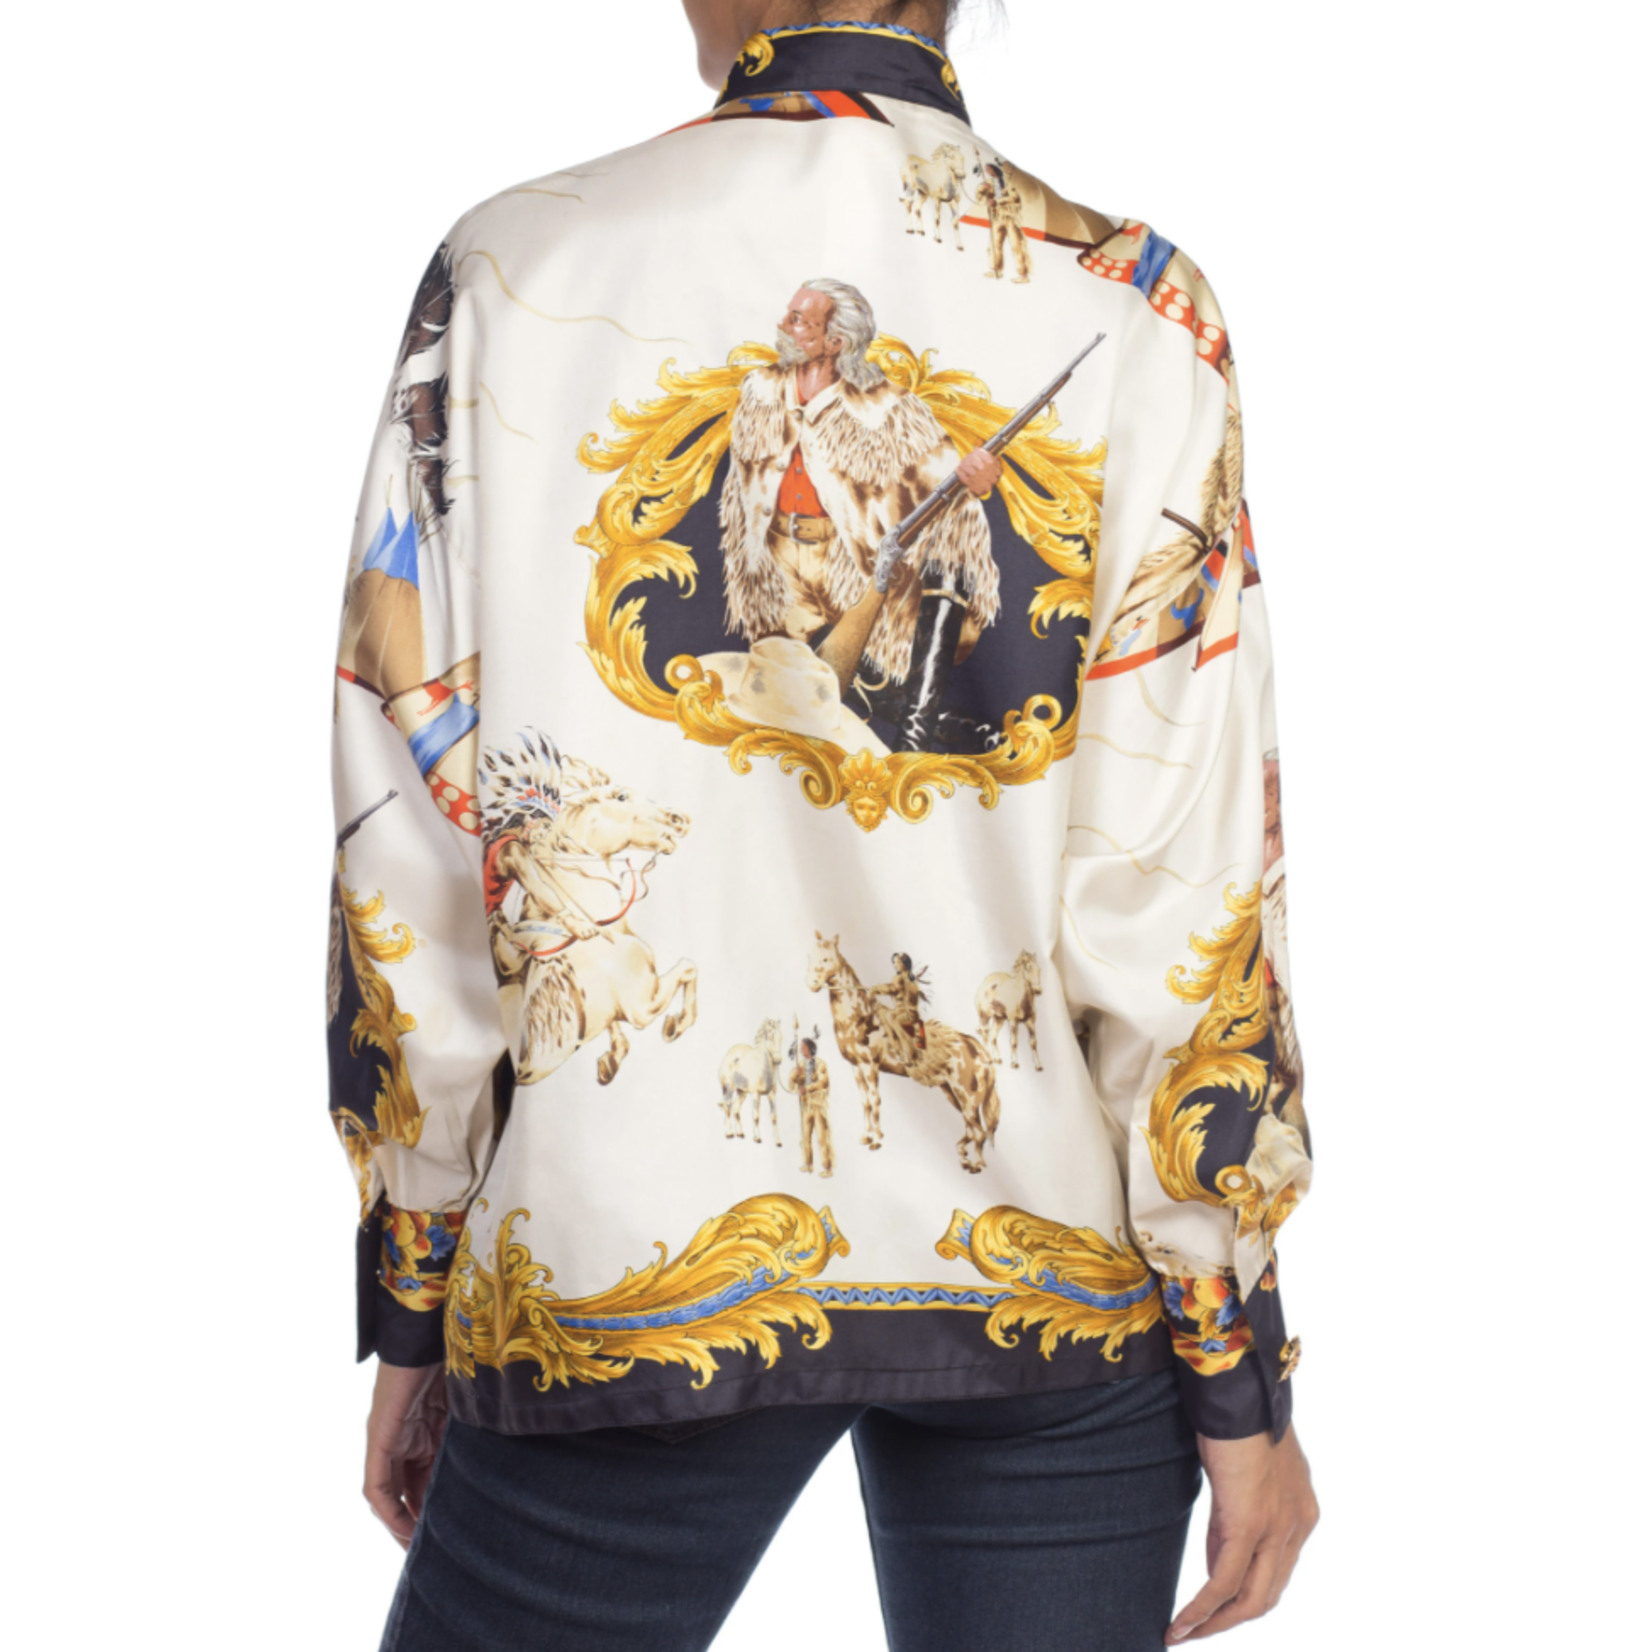 Morphew 1990s Gianni Versace Silk Native American Buffalo Bill Shirt sz 38